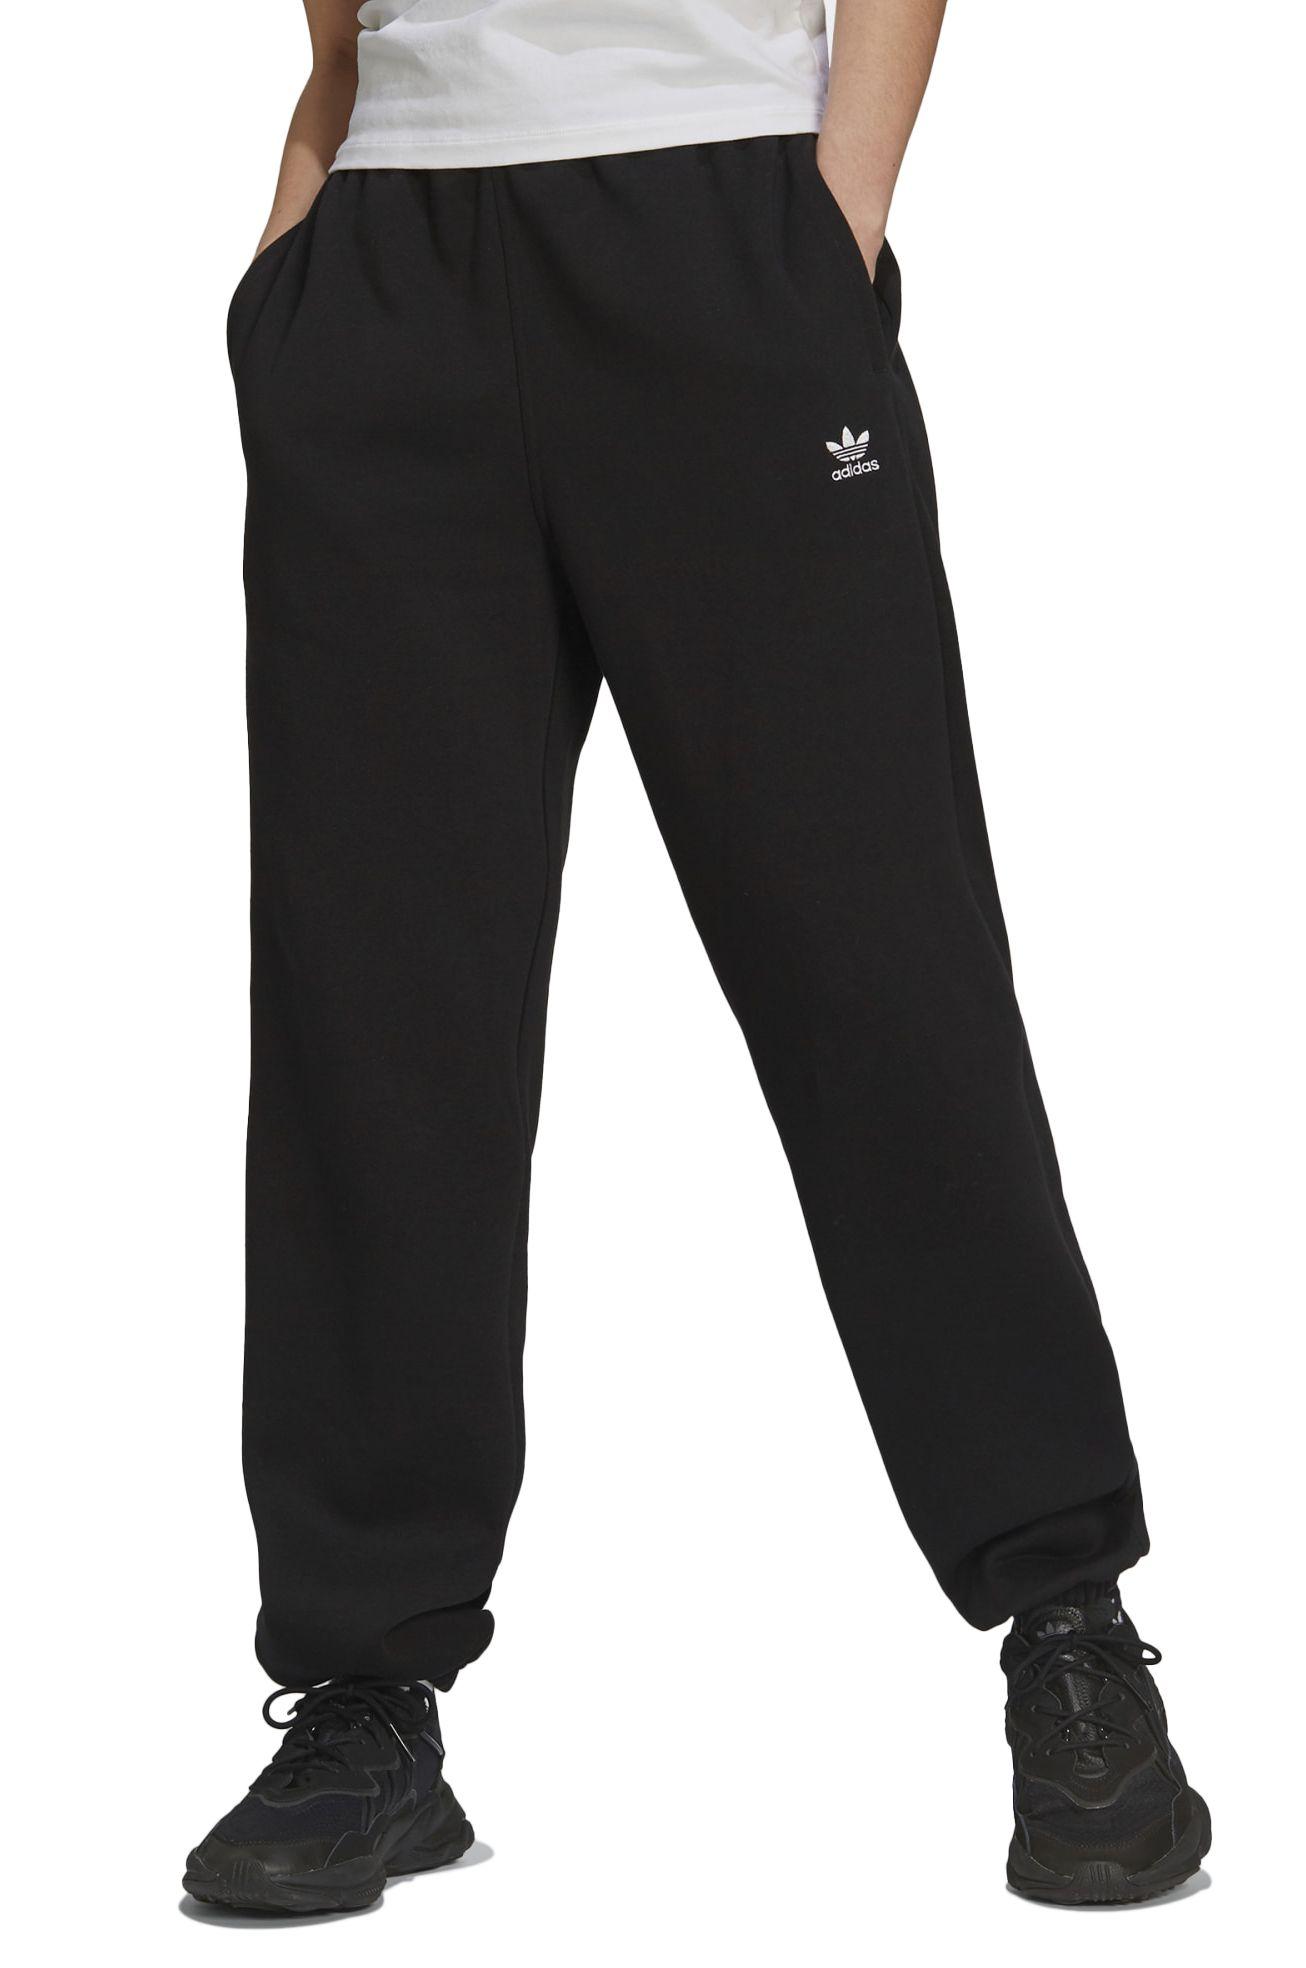 Adidas Pants PANTS Black